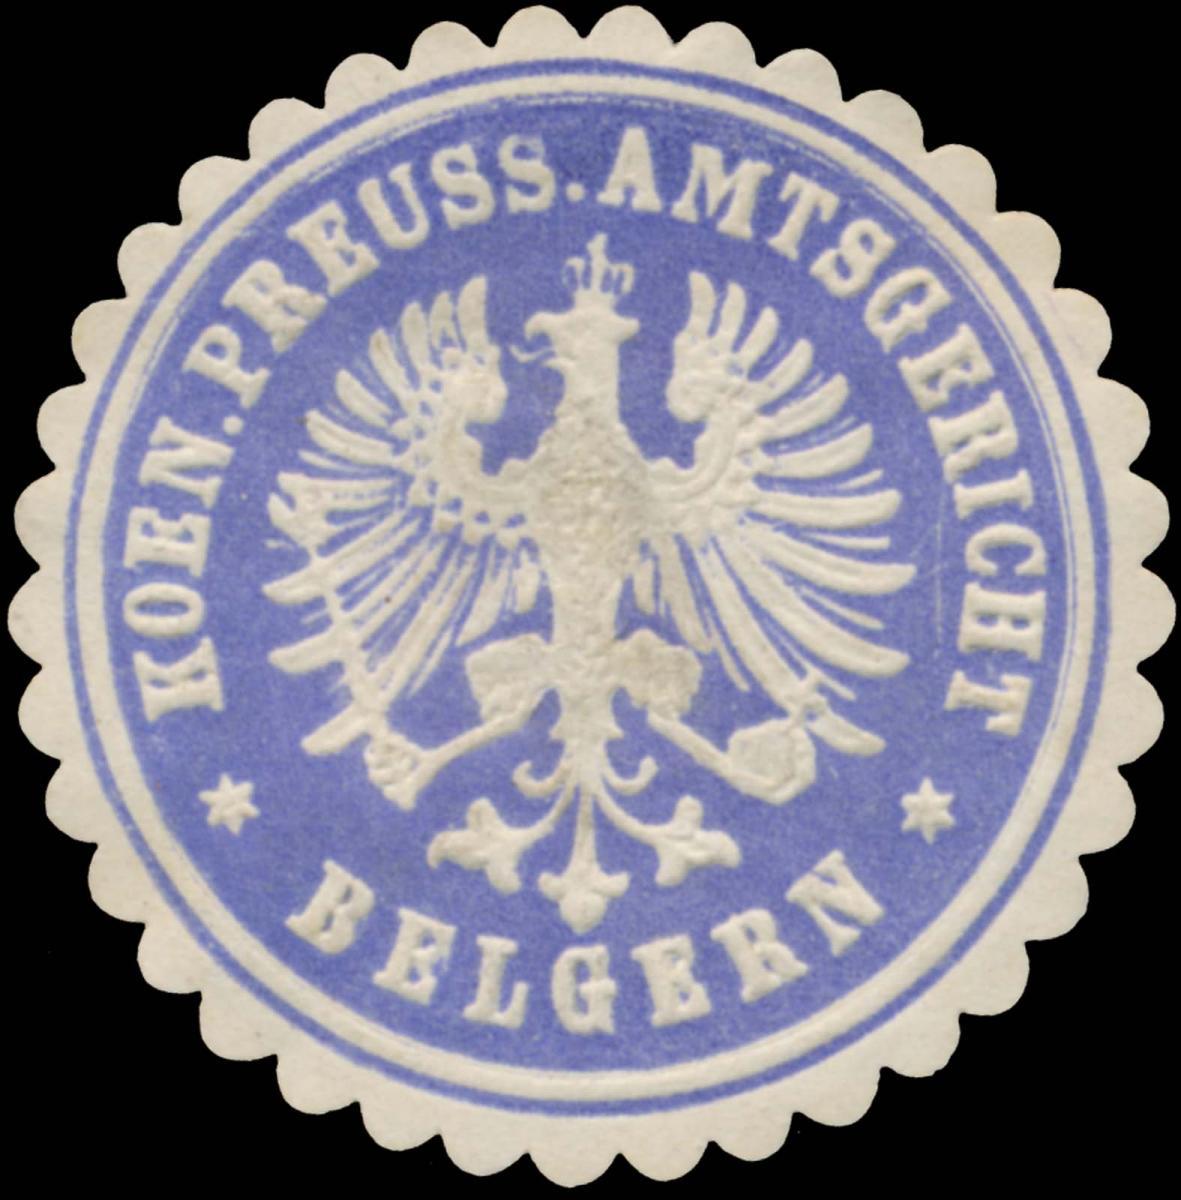 K.Pr. Amtsgericht Belgern